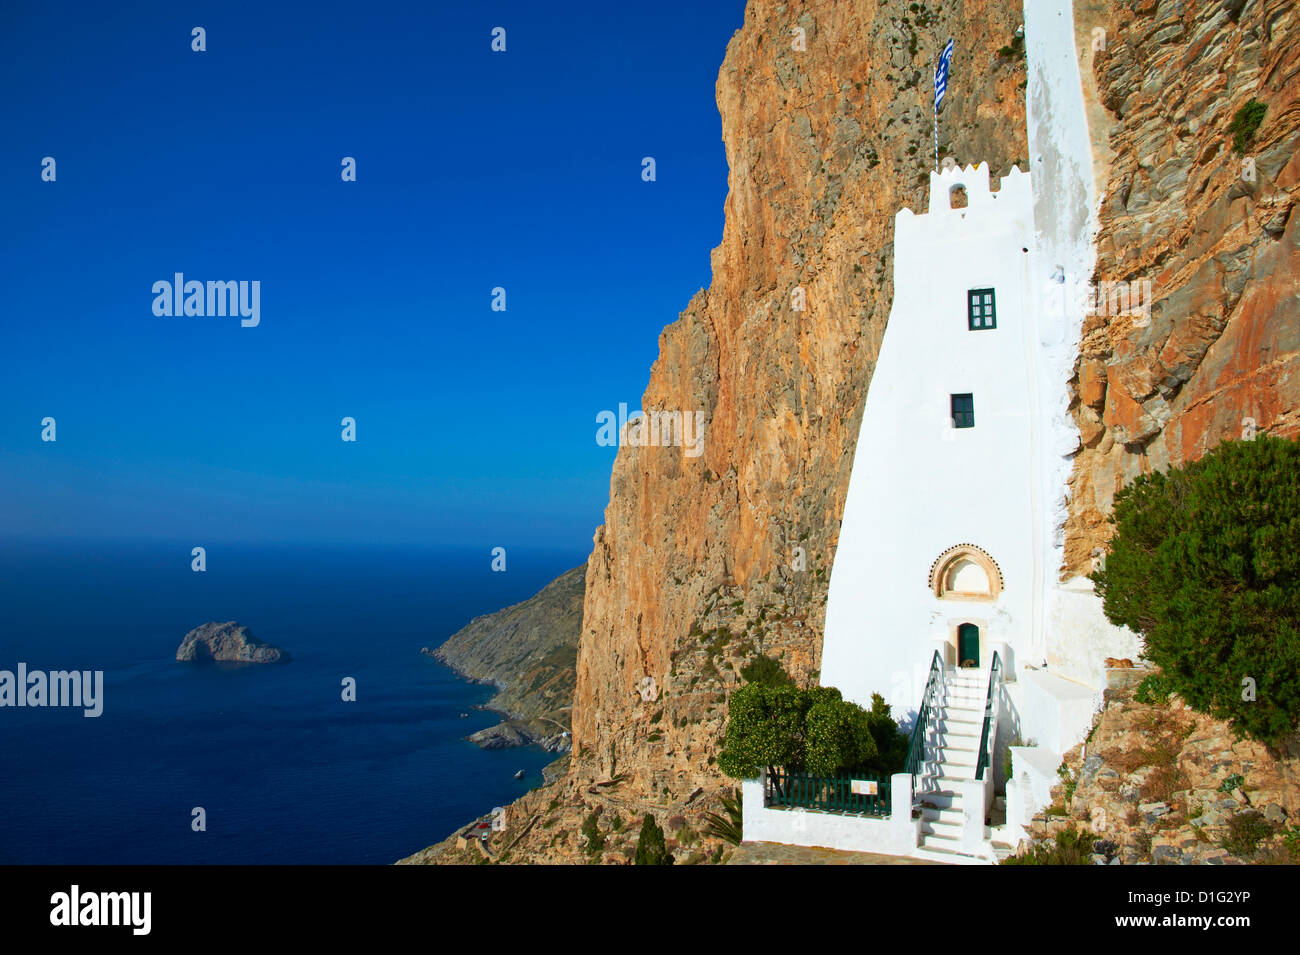 Hozoviotissa monastery and Aegean Sea, Amorgos, Cyclades, Greek Islands, Greece, Europe - Stock Image